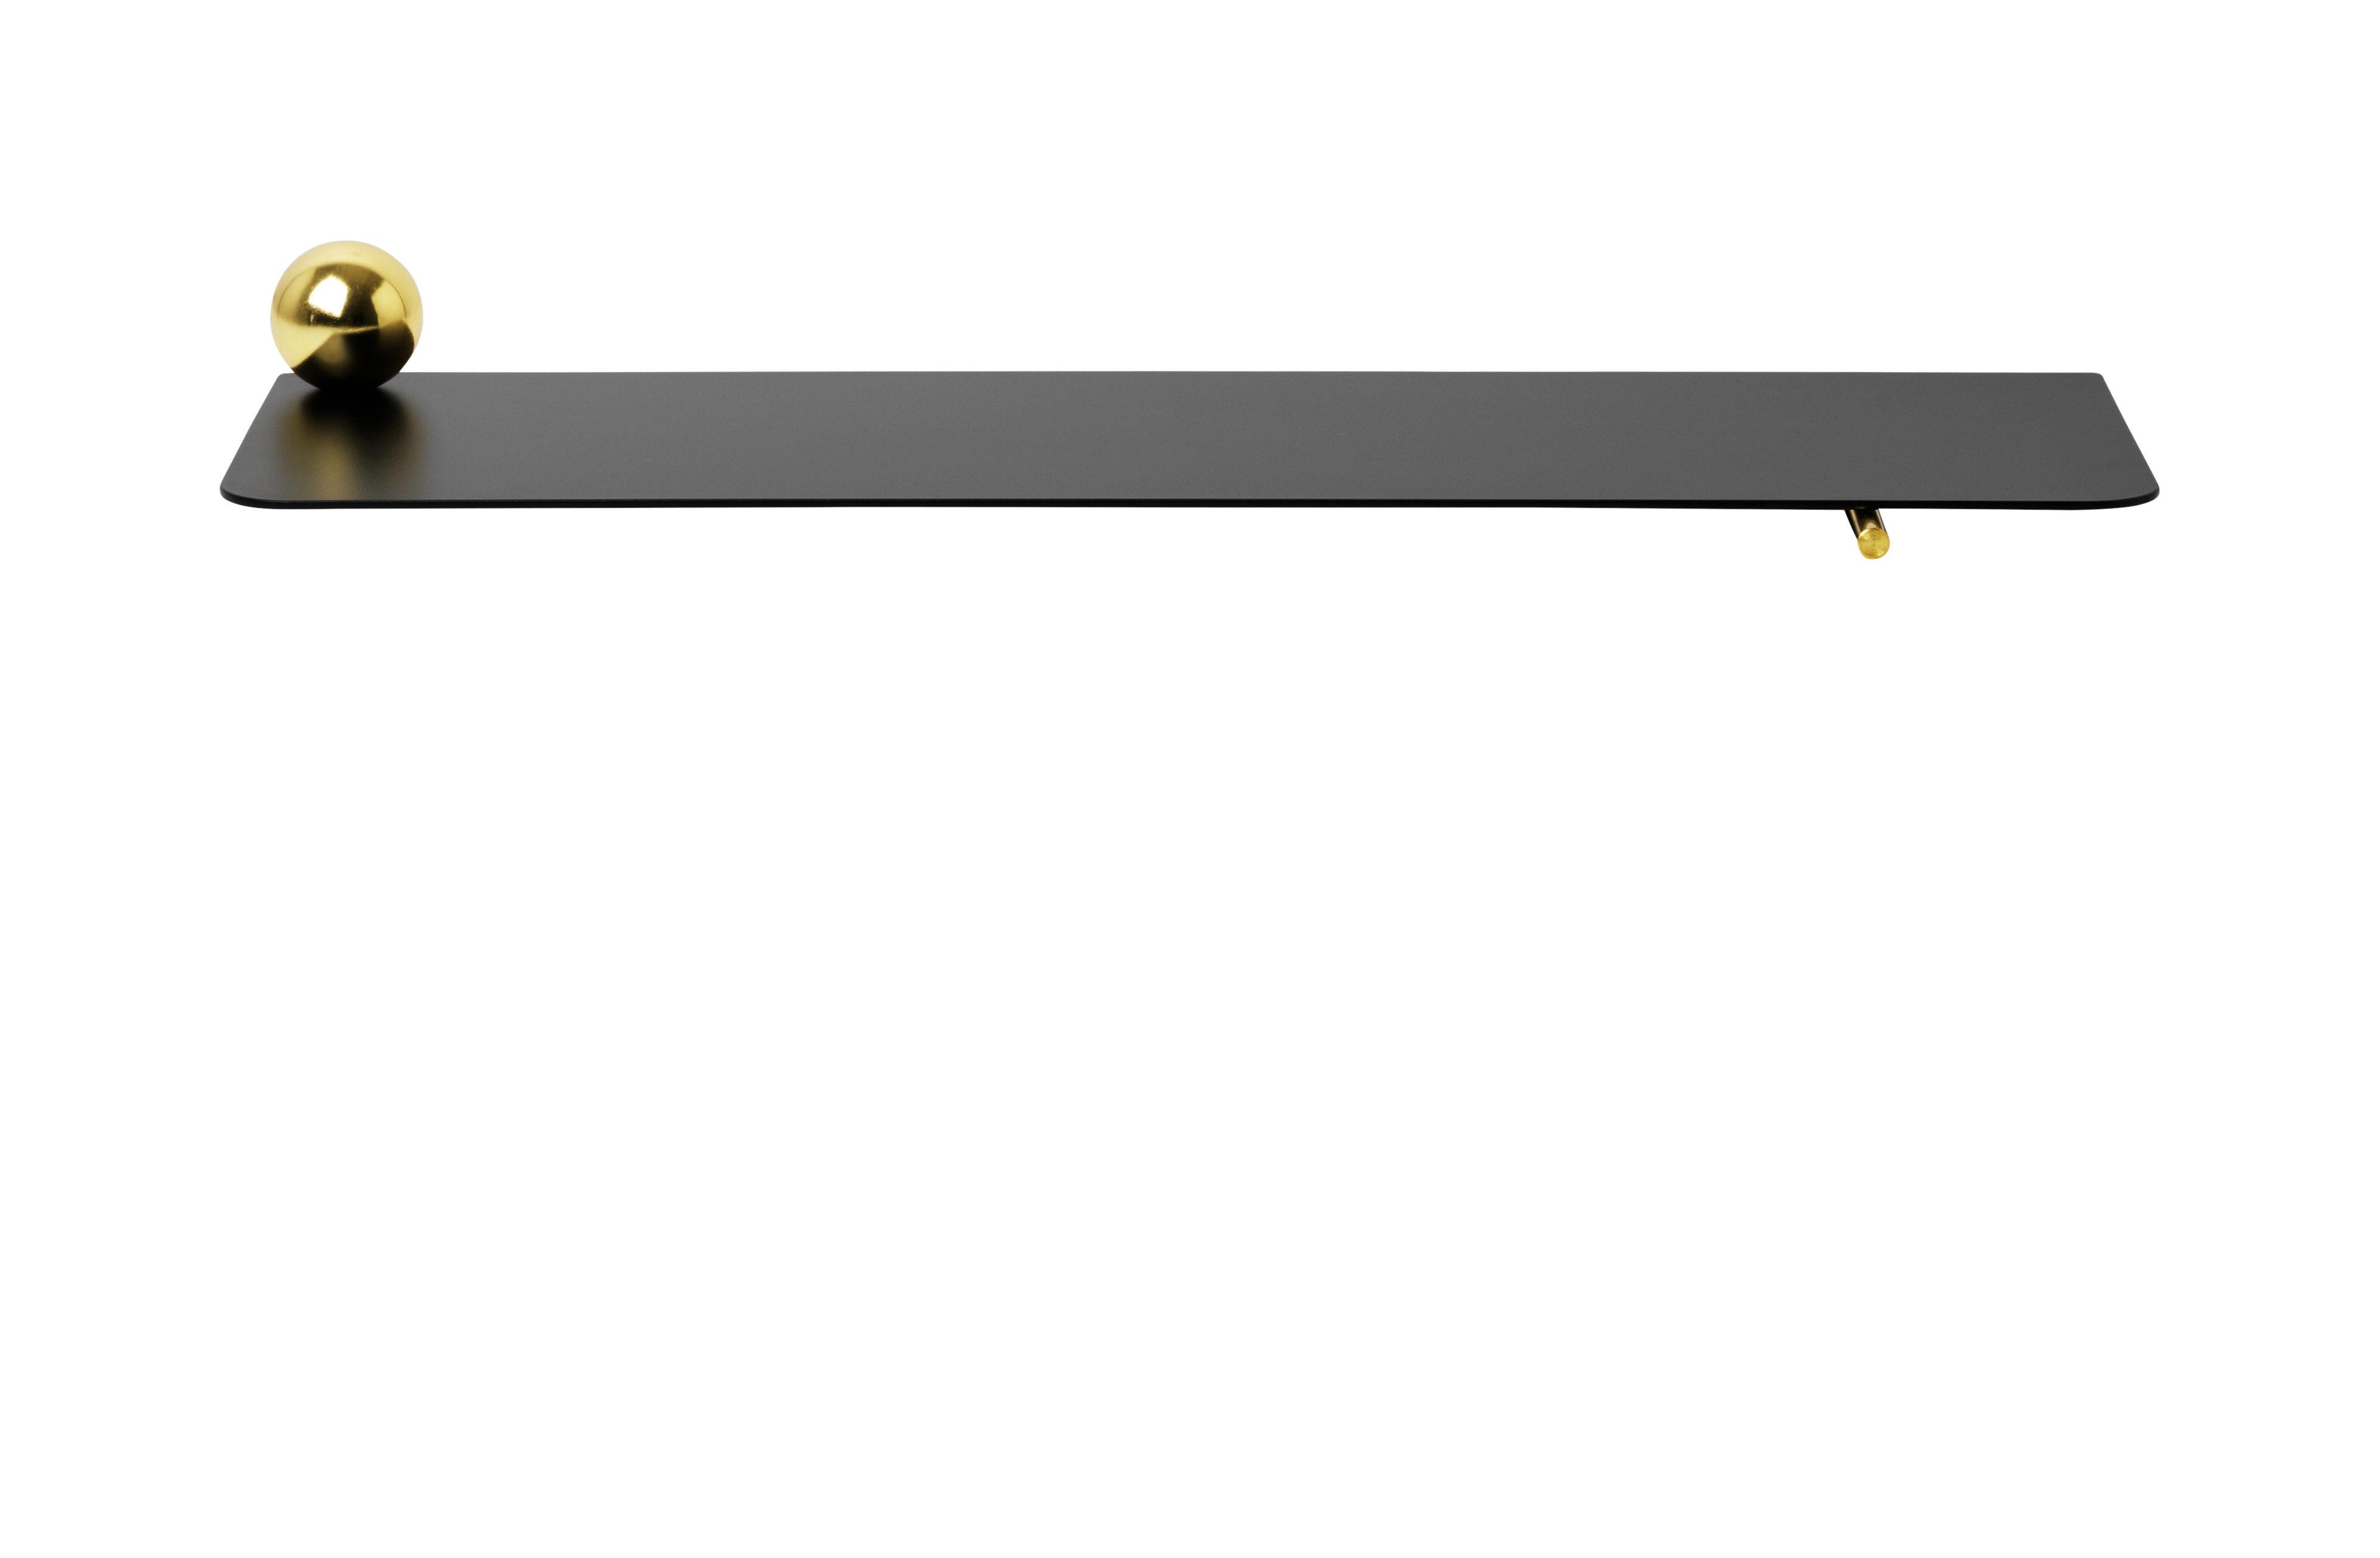 Möbel - Regale und Bücherregale - Flying Sphère Regal / L 60 cm x H 6,3 cm - Ferm Living - Schwarz & Messing - epoxy-beschichtetes Metall, Messing